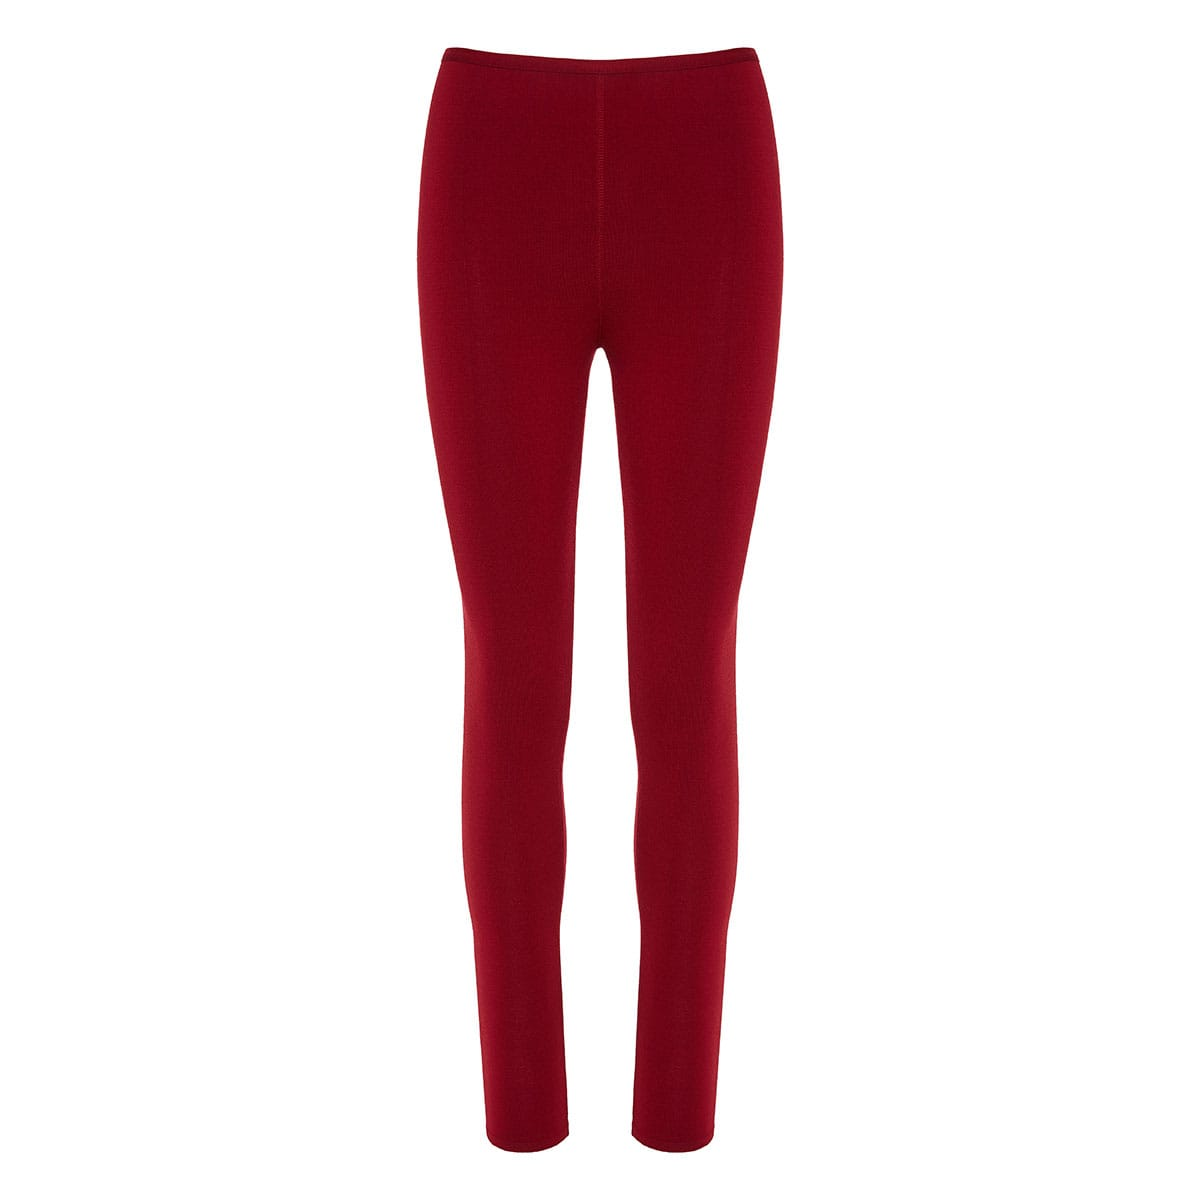 High-waist wool leggings